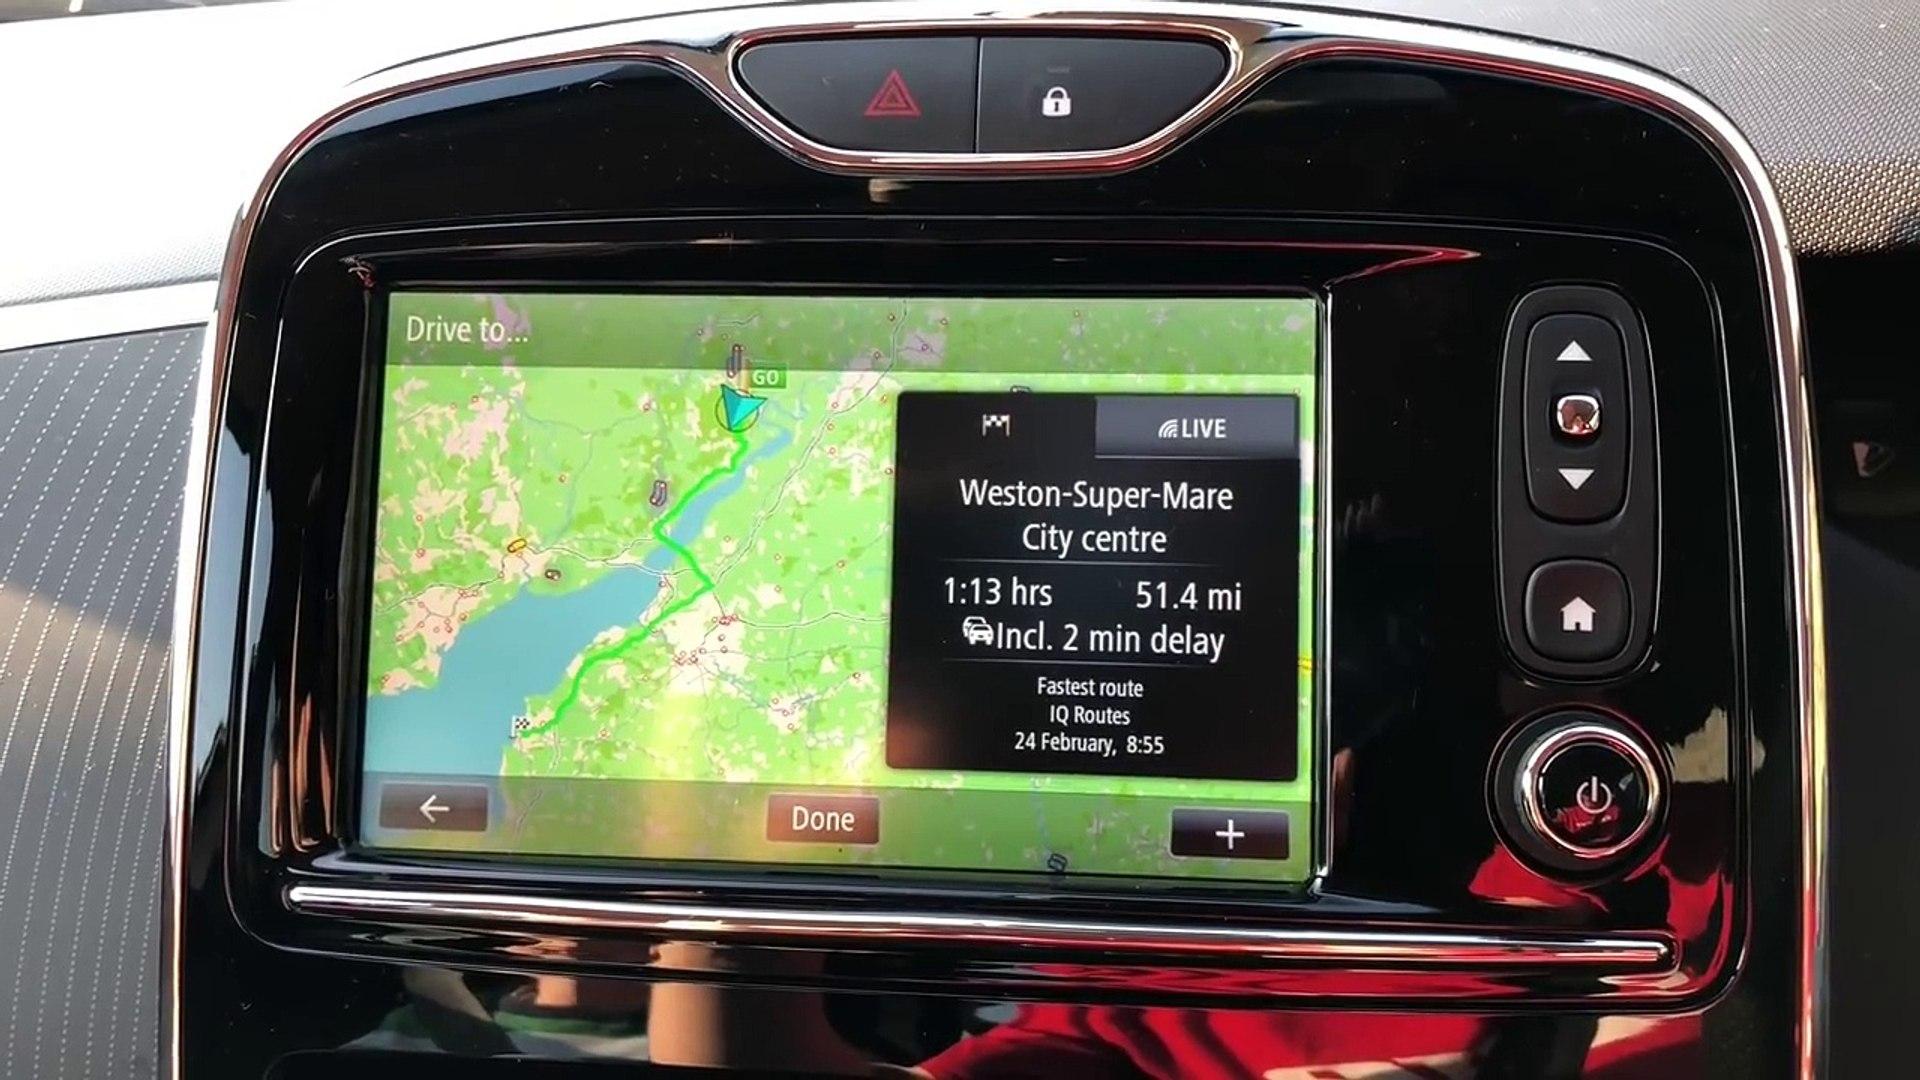 Renault Zoe 100 Mile Family Trip - Weston Super Mare Trip (Blog 4)